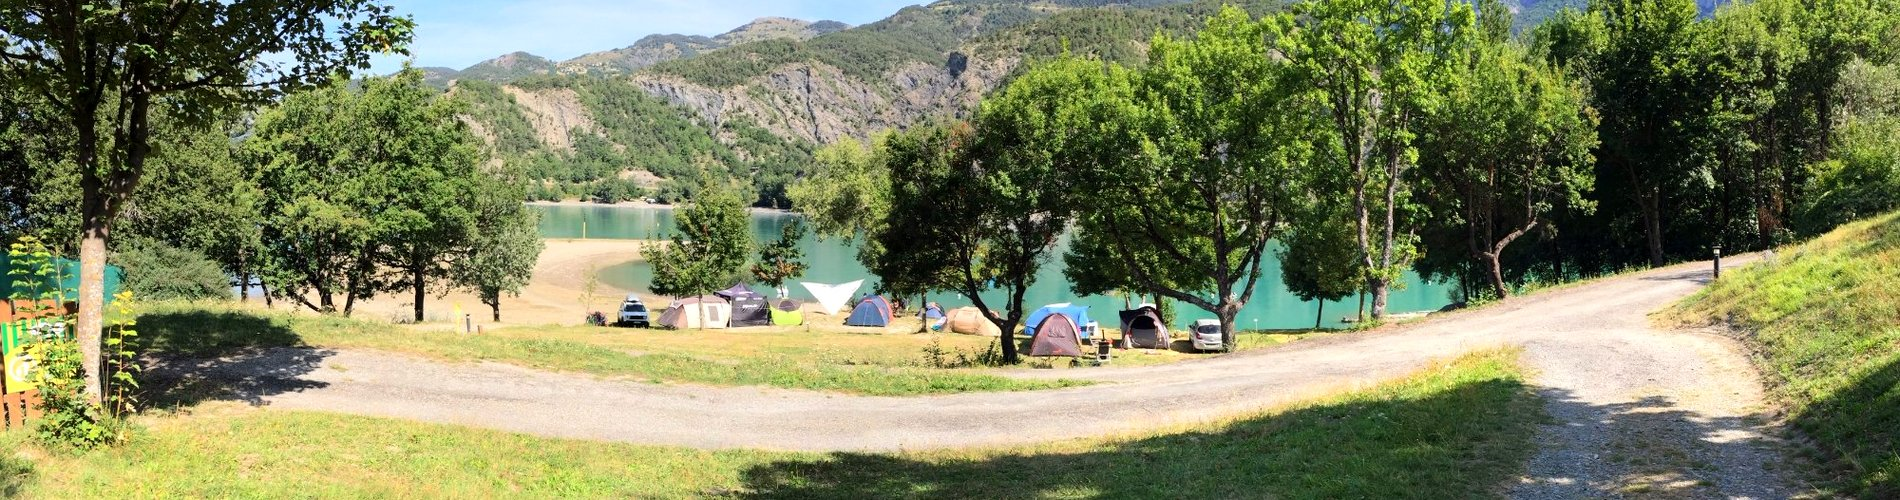 camping-lac-serre-poncon-emplacements-bandeau